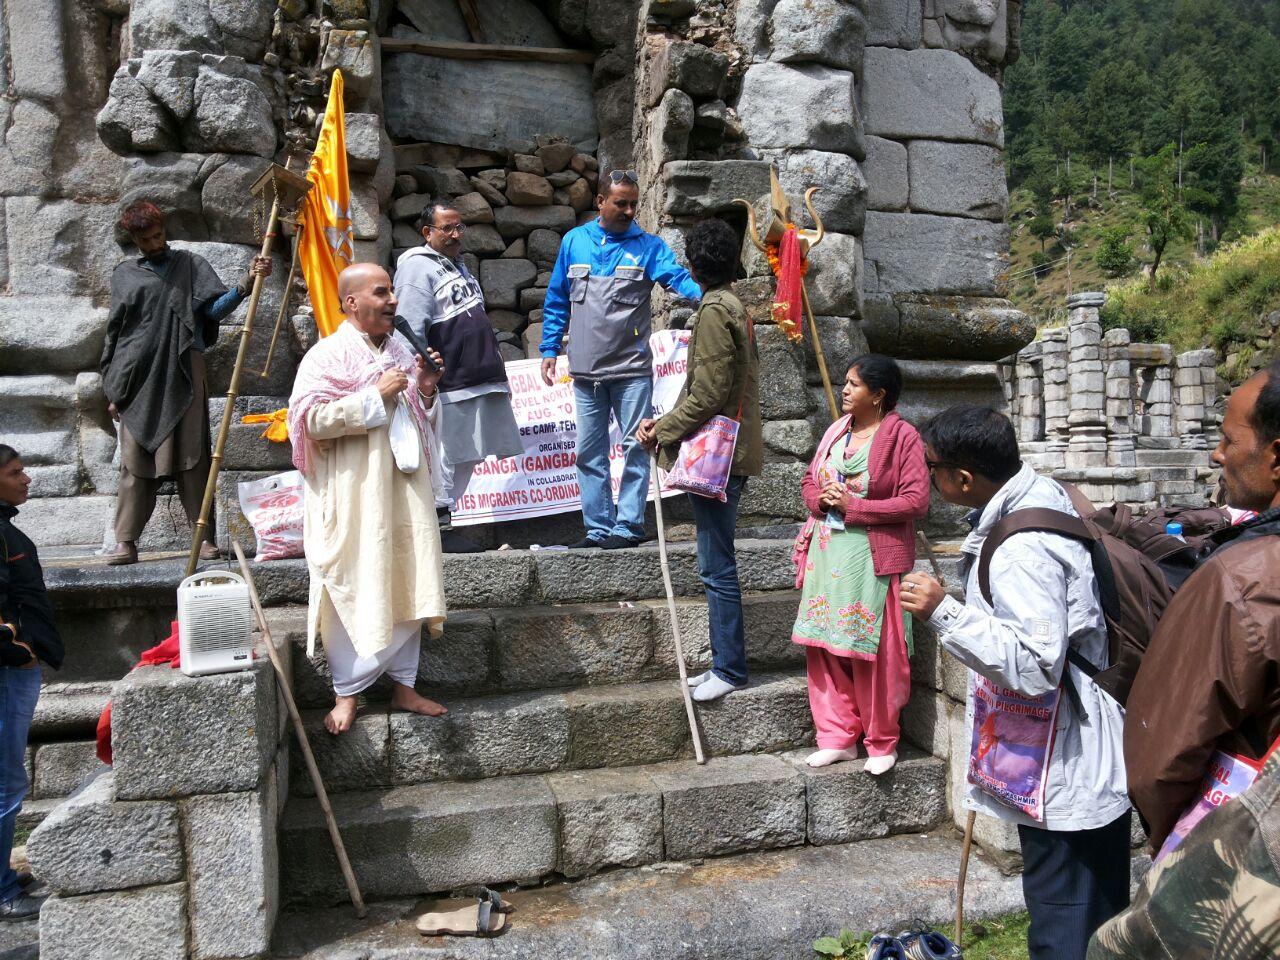 Braving unrest, Pandits perform Gangbal yatra in Kashmir